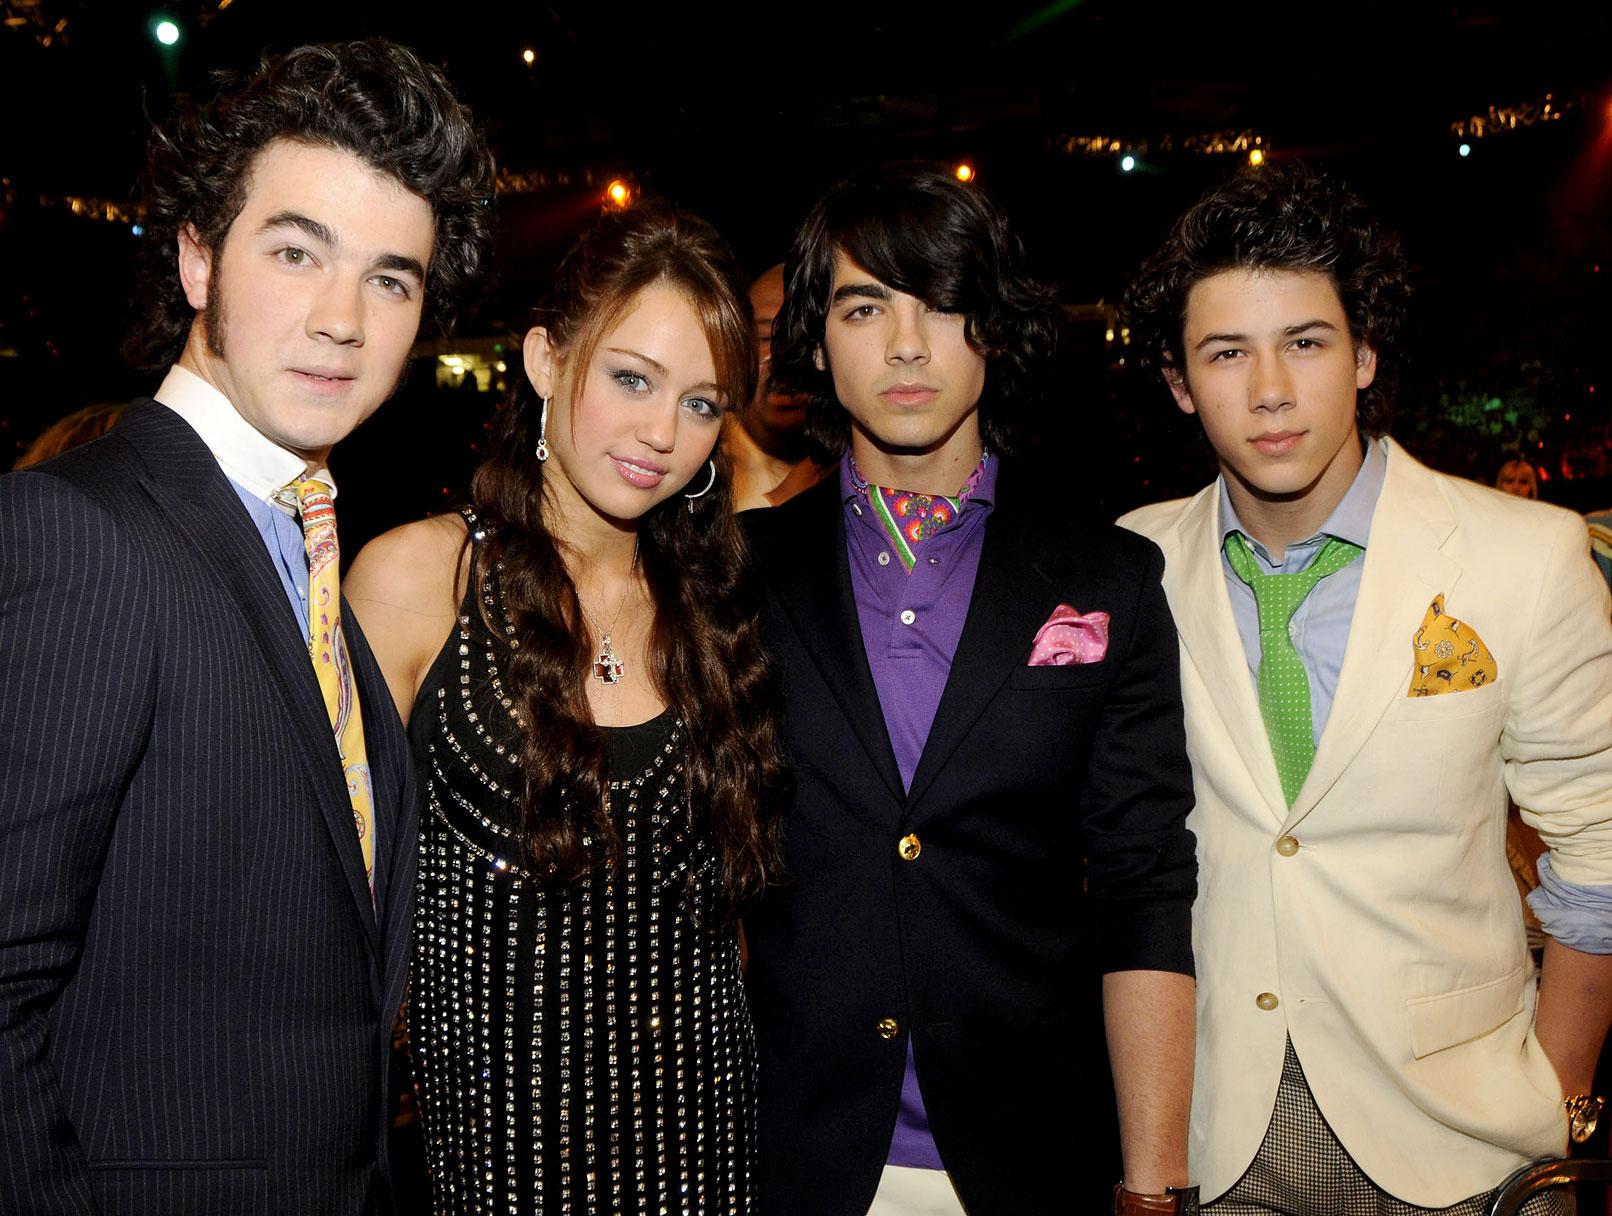 Miley Cyrus: Making Music With Nick Jonas